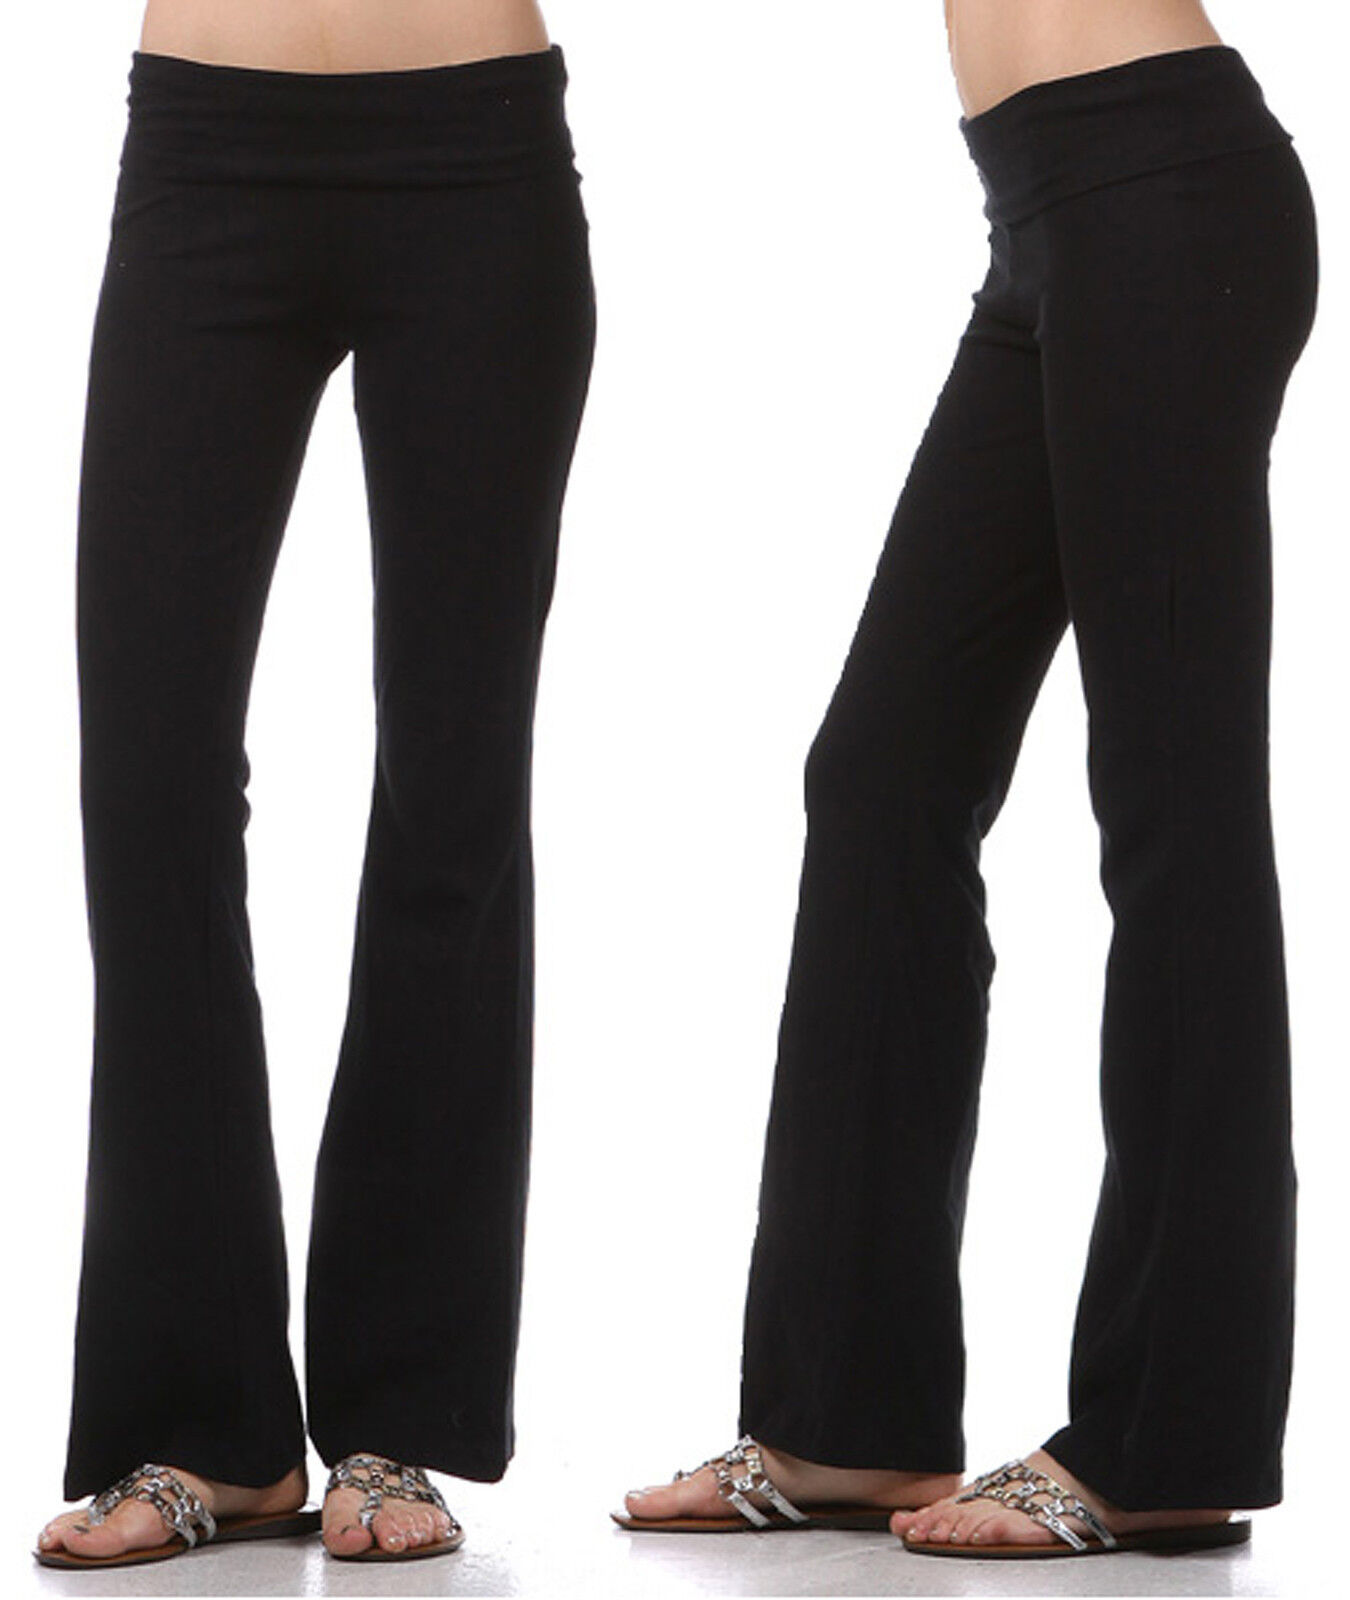 YOGA Pants Flare Leg Long Fitness Foldover Waist Womens Workout Gym Zenana